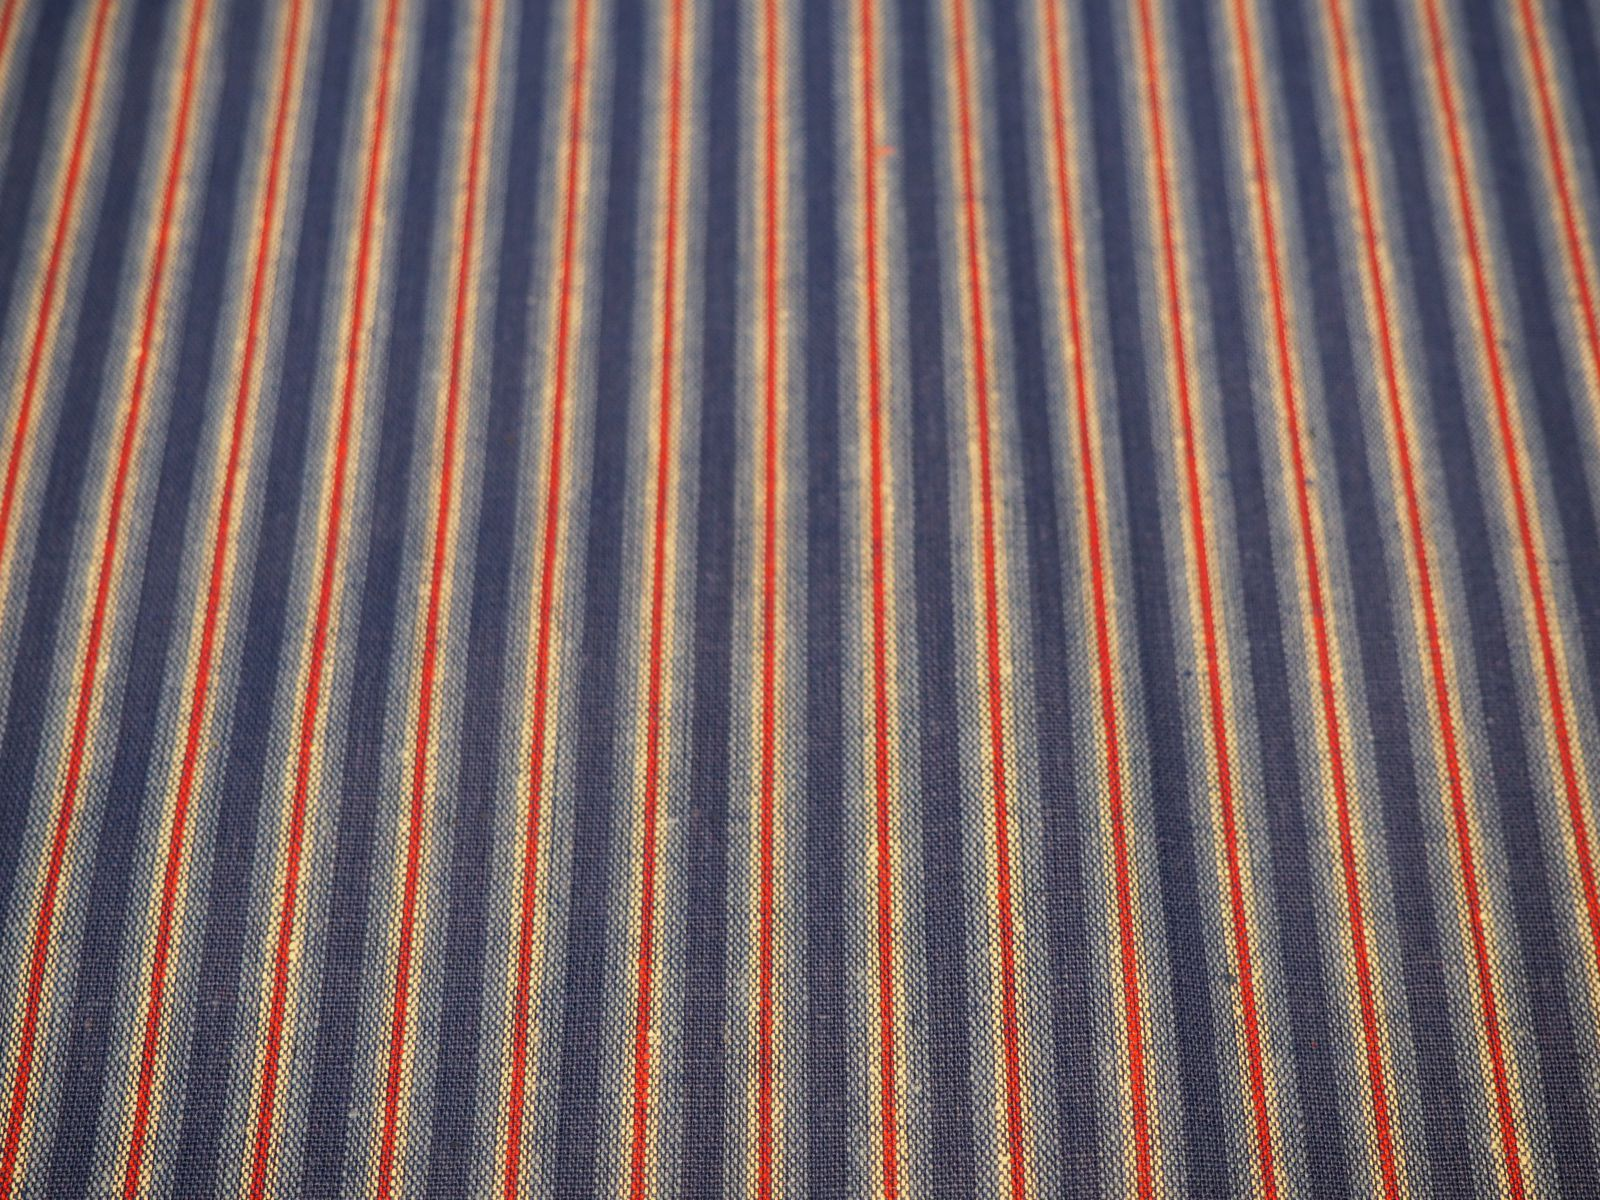 72d8b97e7b9 Katoen - rood en blauw gestreept